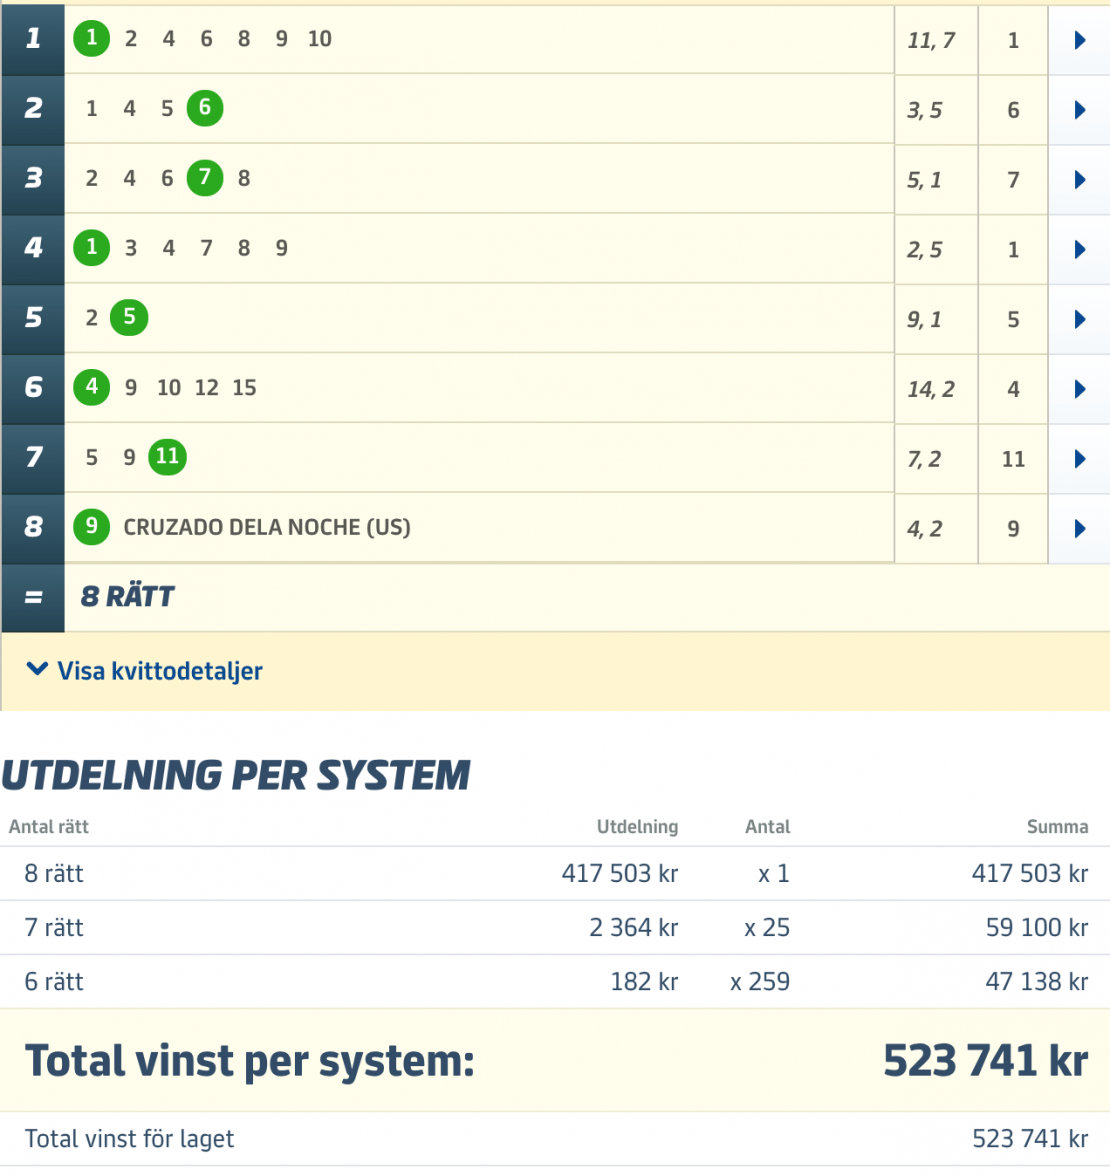 VI VANN MEST I SVERIGE – 43.645:-/ANDEL